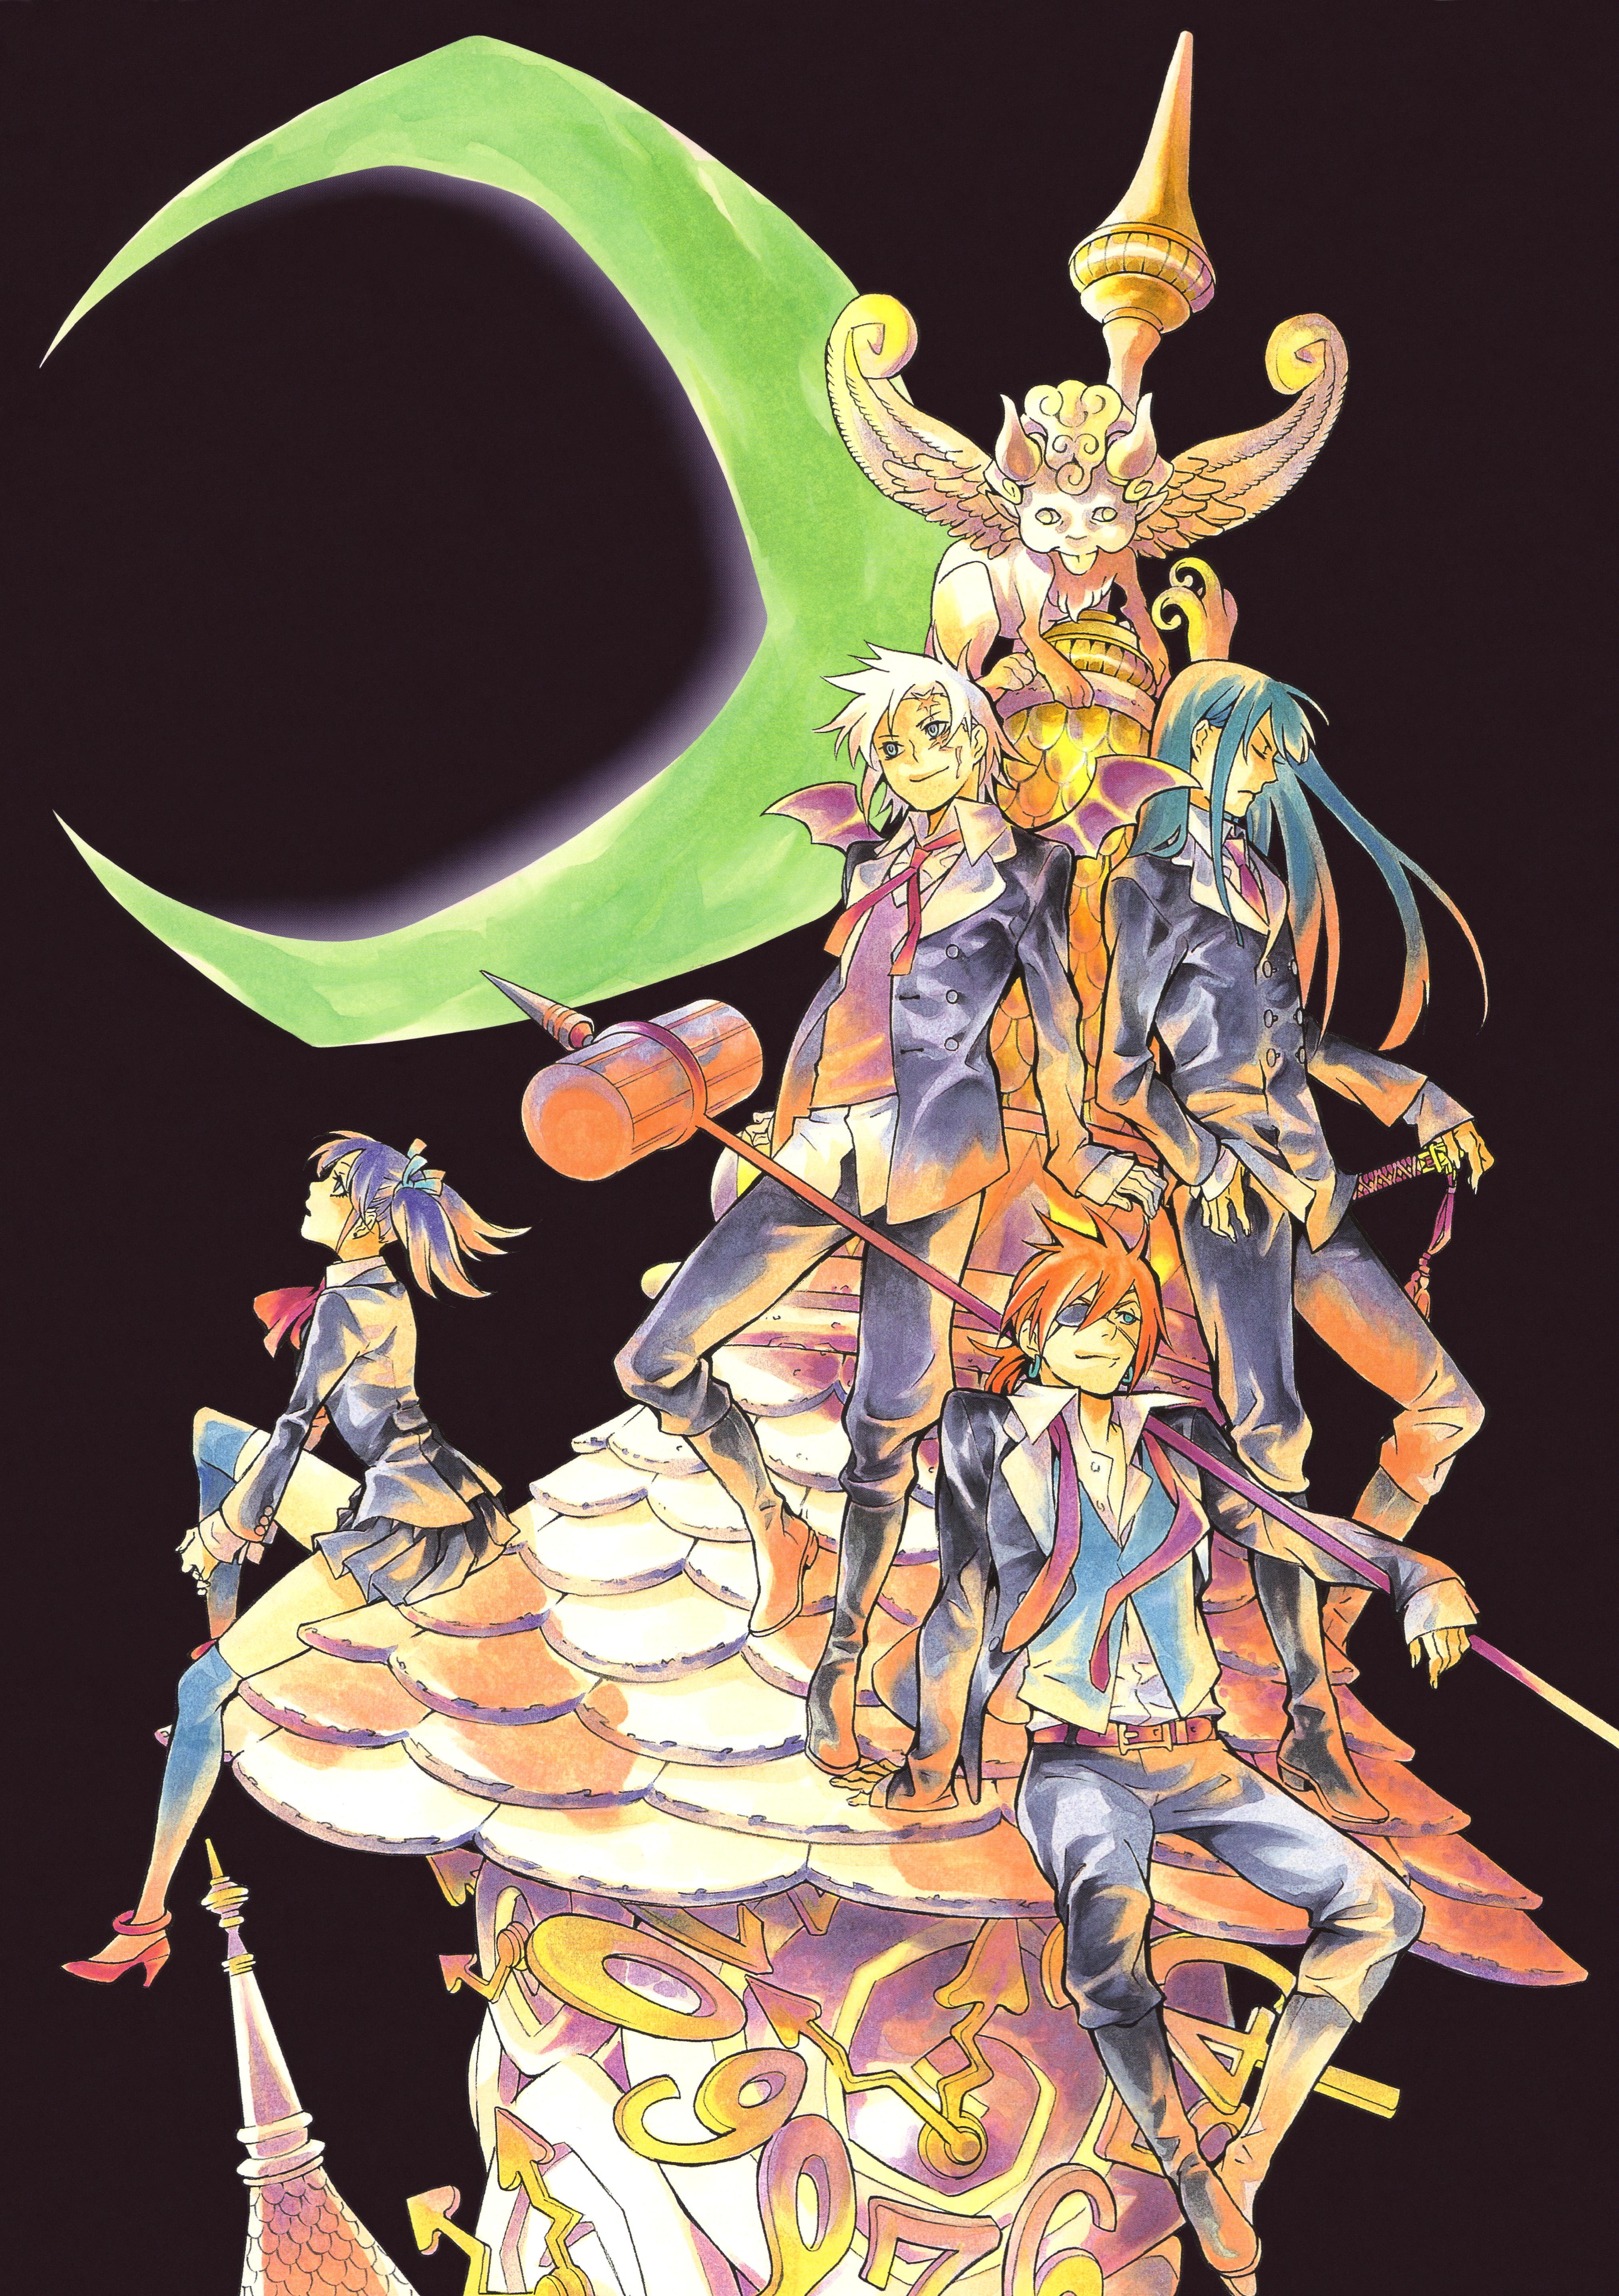 Hoshino katsura zerochan anime image board - D gray man images ...